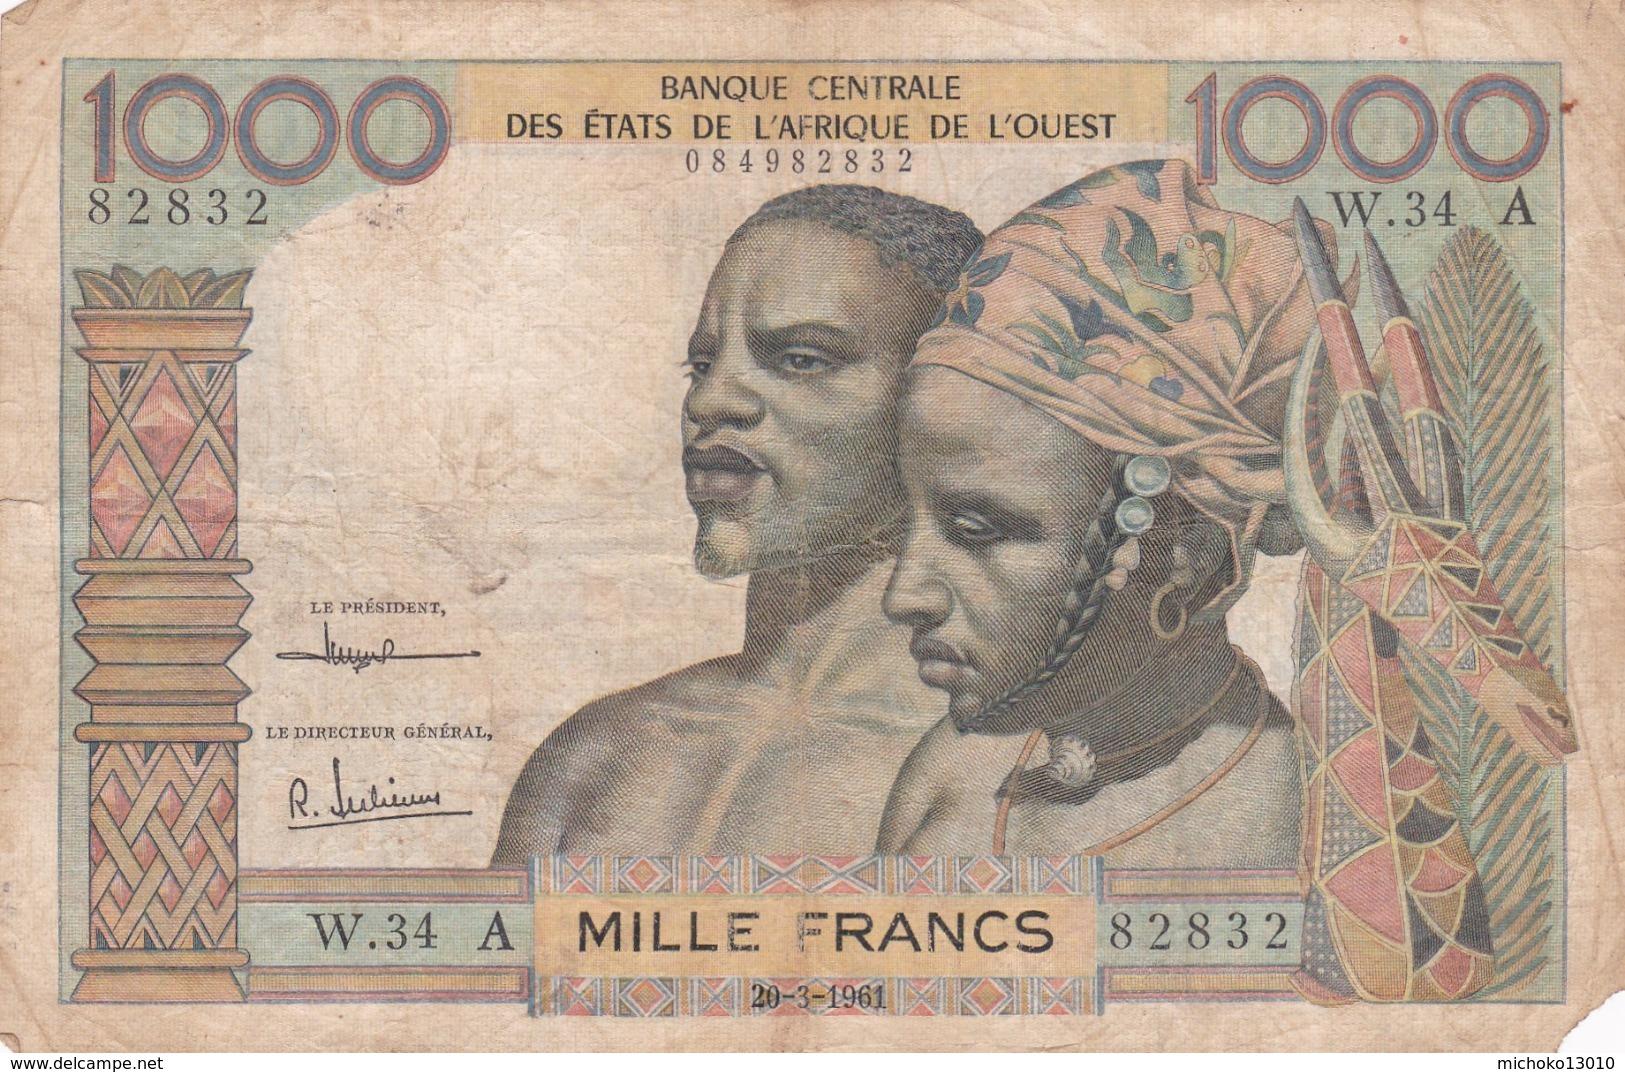 BILLET 1000 FRANCS CFA COTE D IVOIRE PICK 103 A VOIR SCAN - Stati Dell'Africa Occidentale